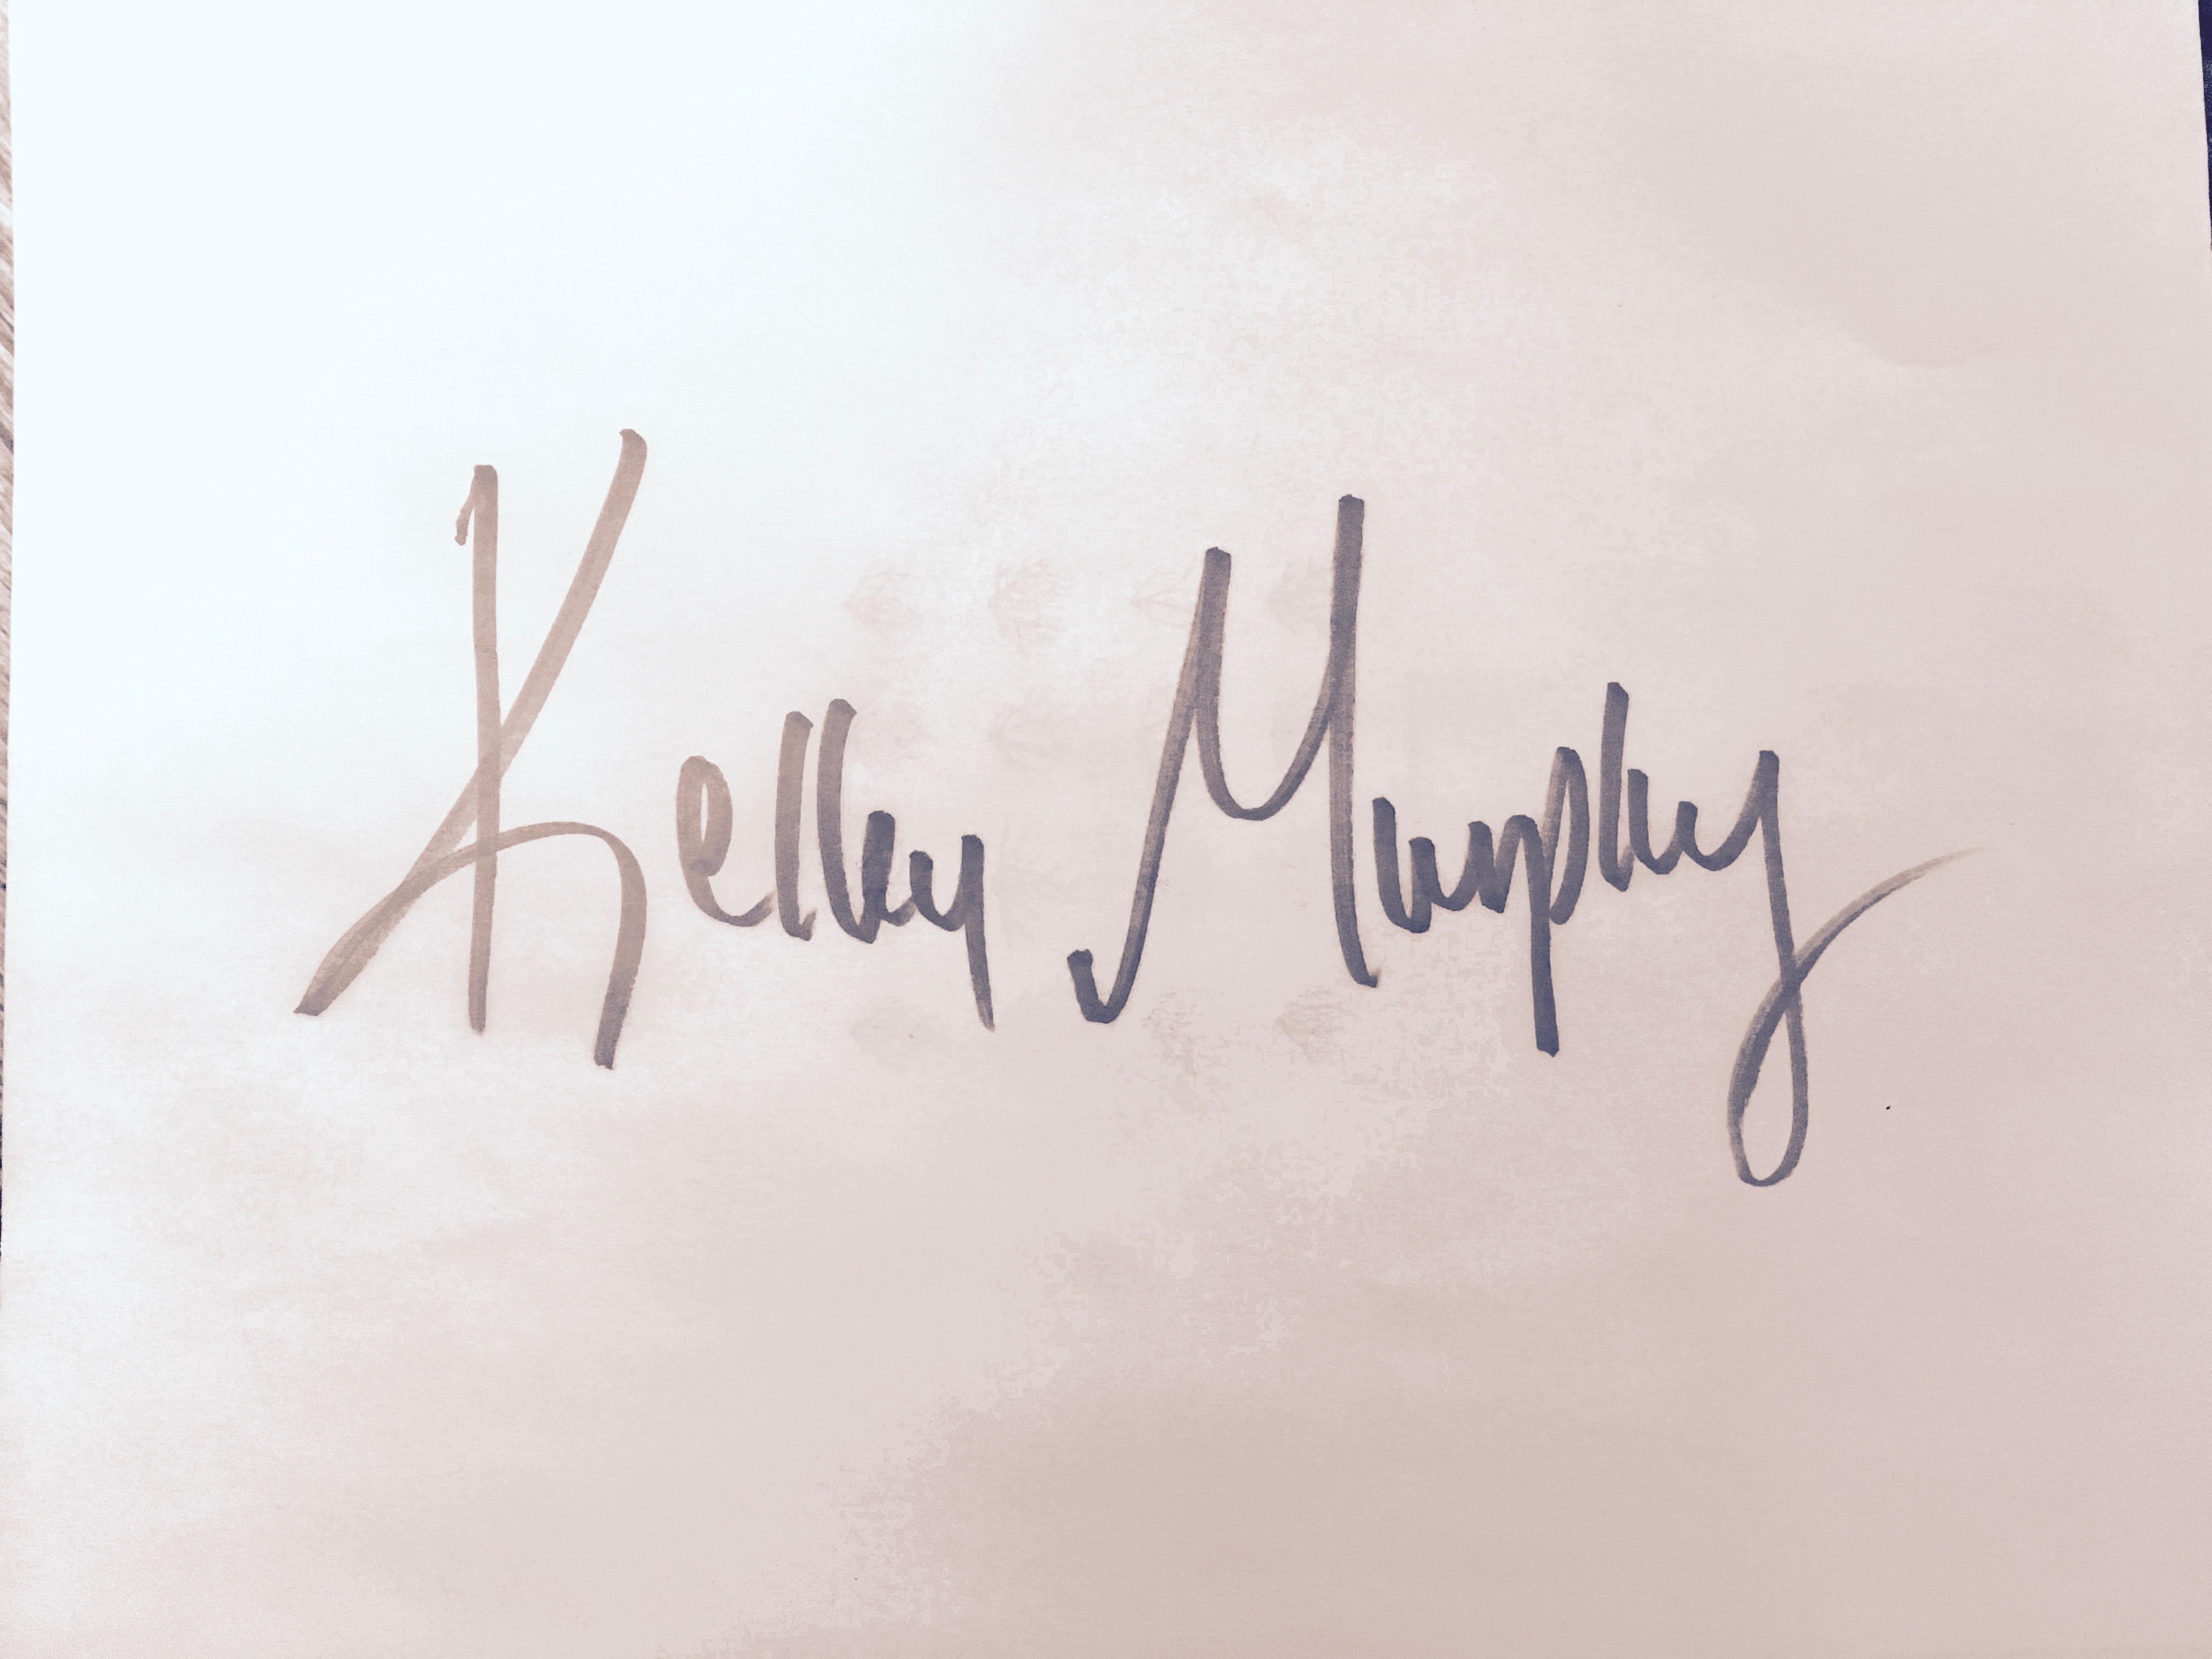 Kelley Murphy's Signature